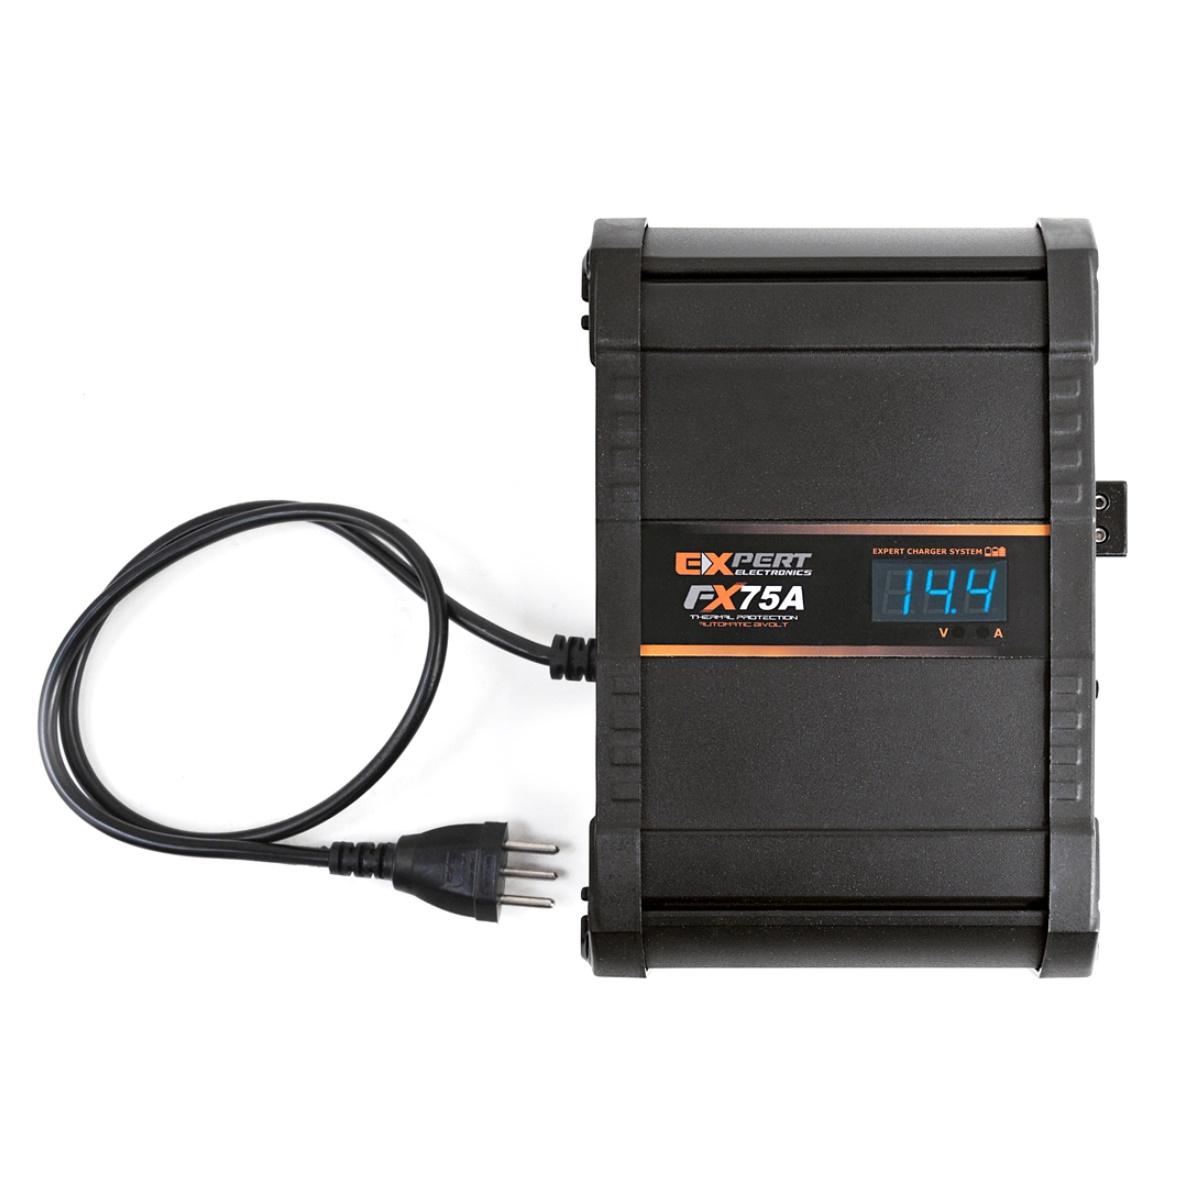 Fonte e Carregador Expert FX75A 75 Amperes 12 Volts com Voltímetro e Amperímetro Bivolt